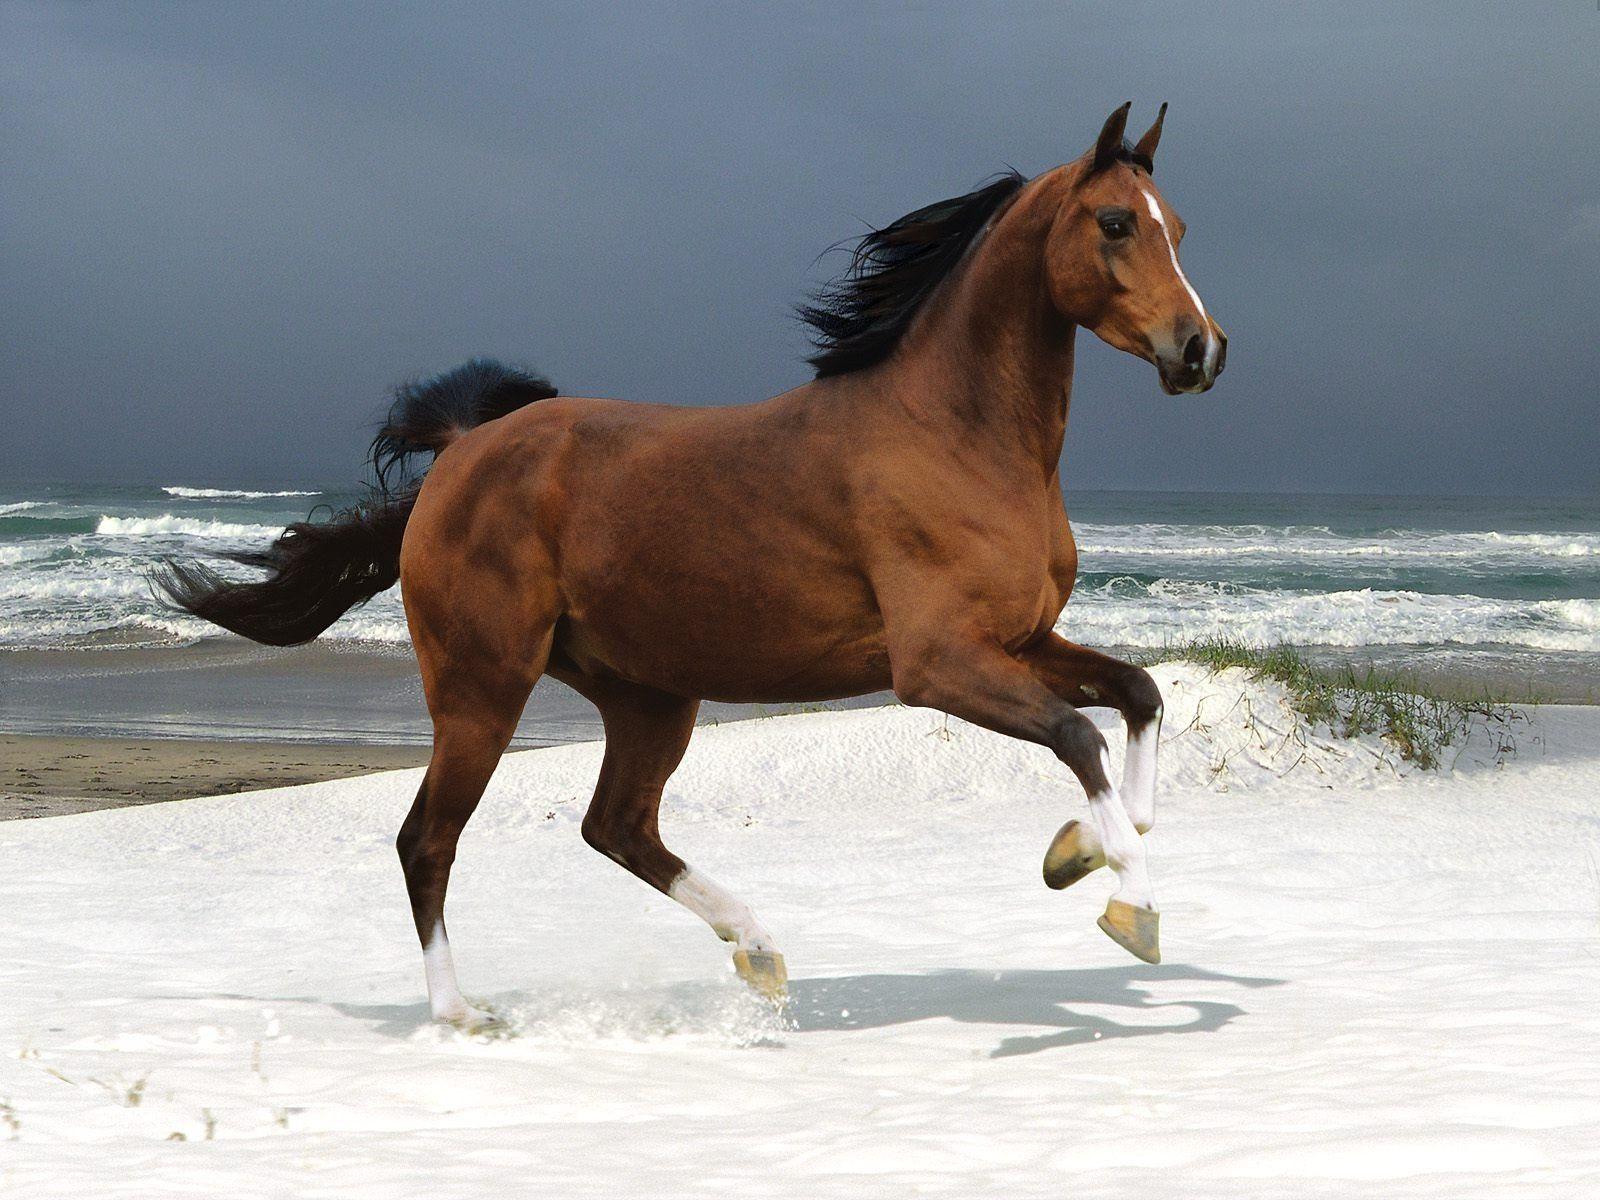 Simple Wallpaper Horse Flicka - 659776efac38bc0093831871428c5b43  Pictures_488160.jpg